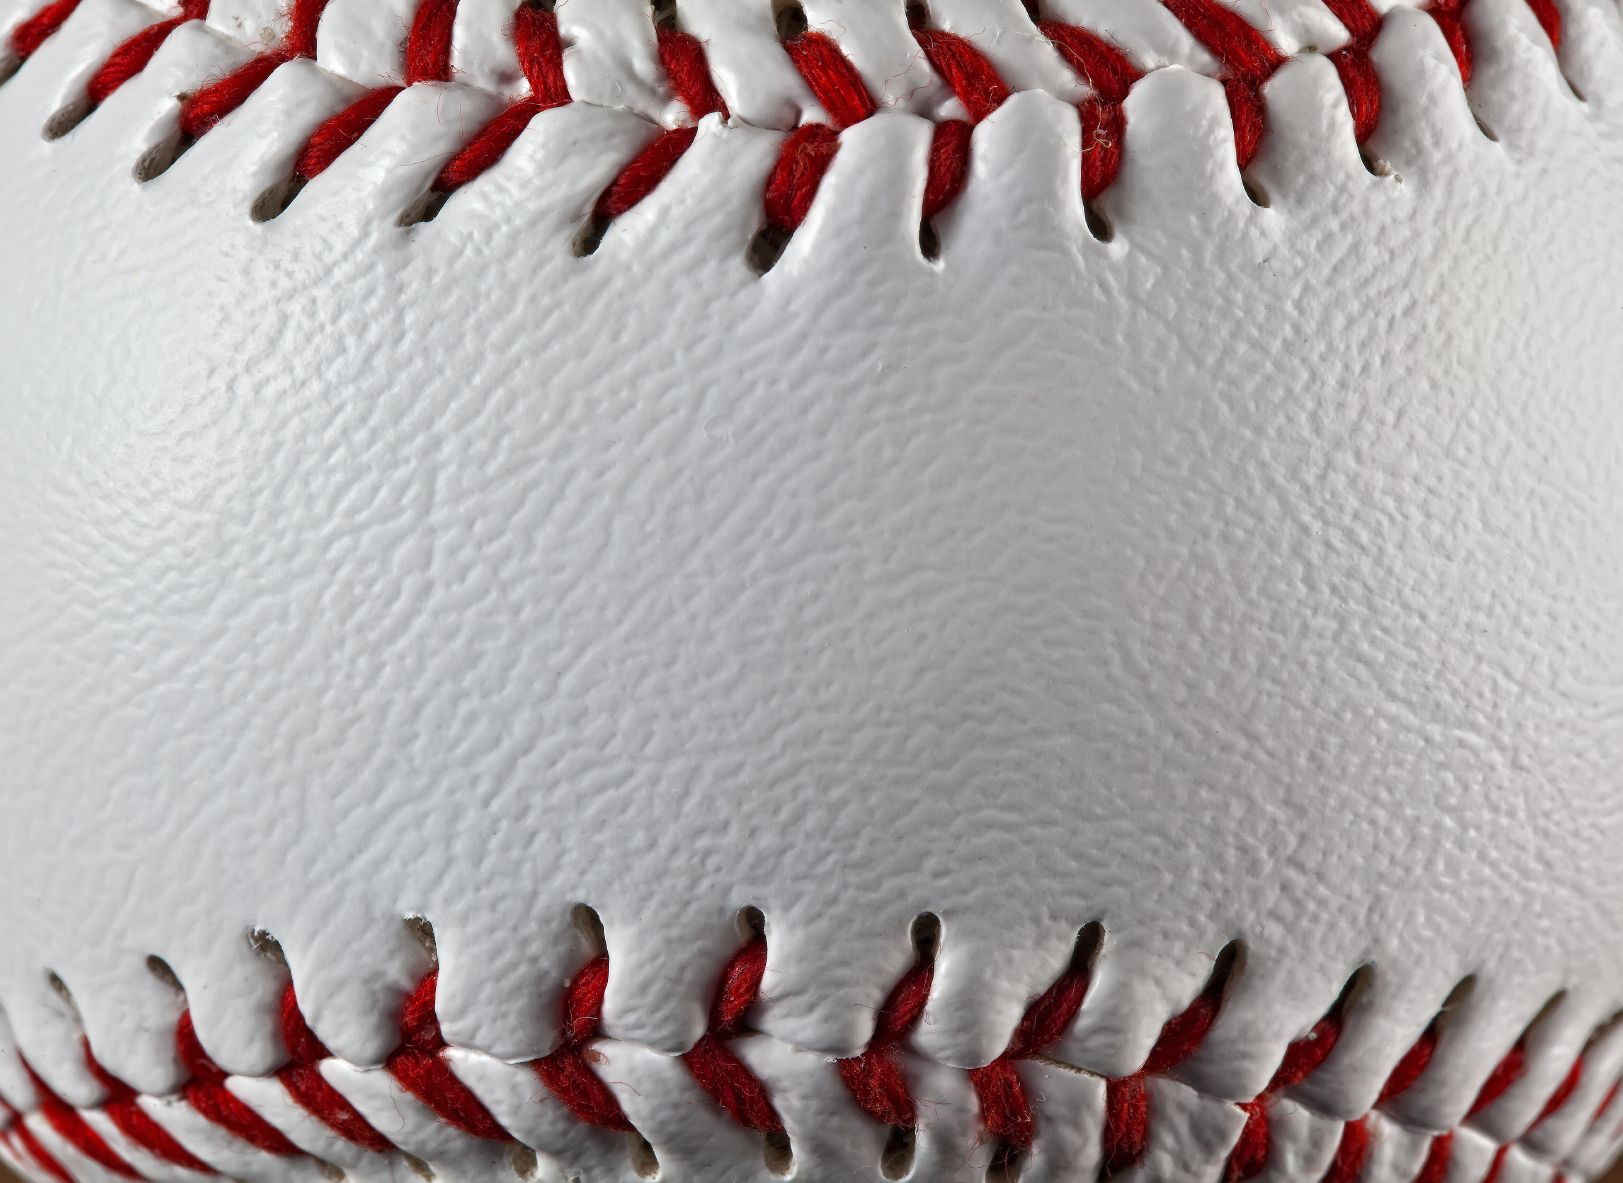 7 Effective Theraband Exercises For Baseball Free Handout Theraband Exercises Stock Images Theraband